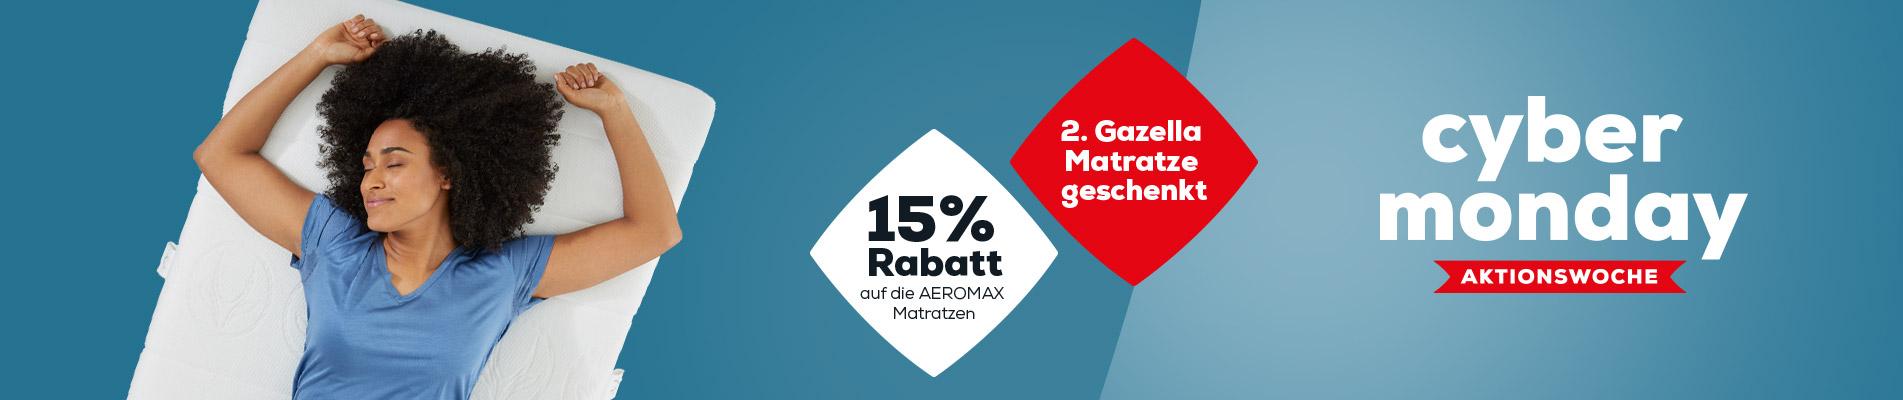 cyber monday Matratzen banner | Swiss Sense